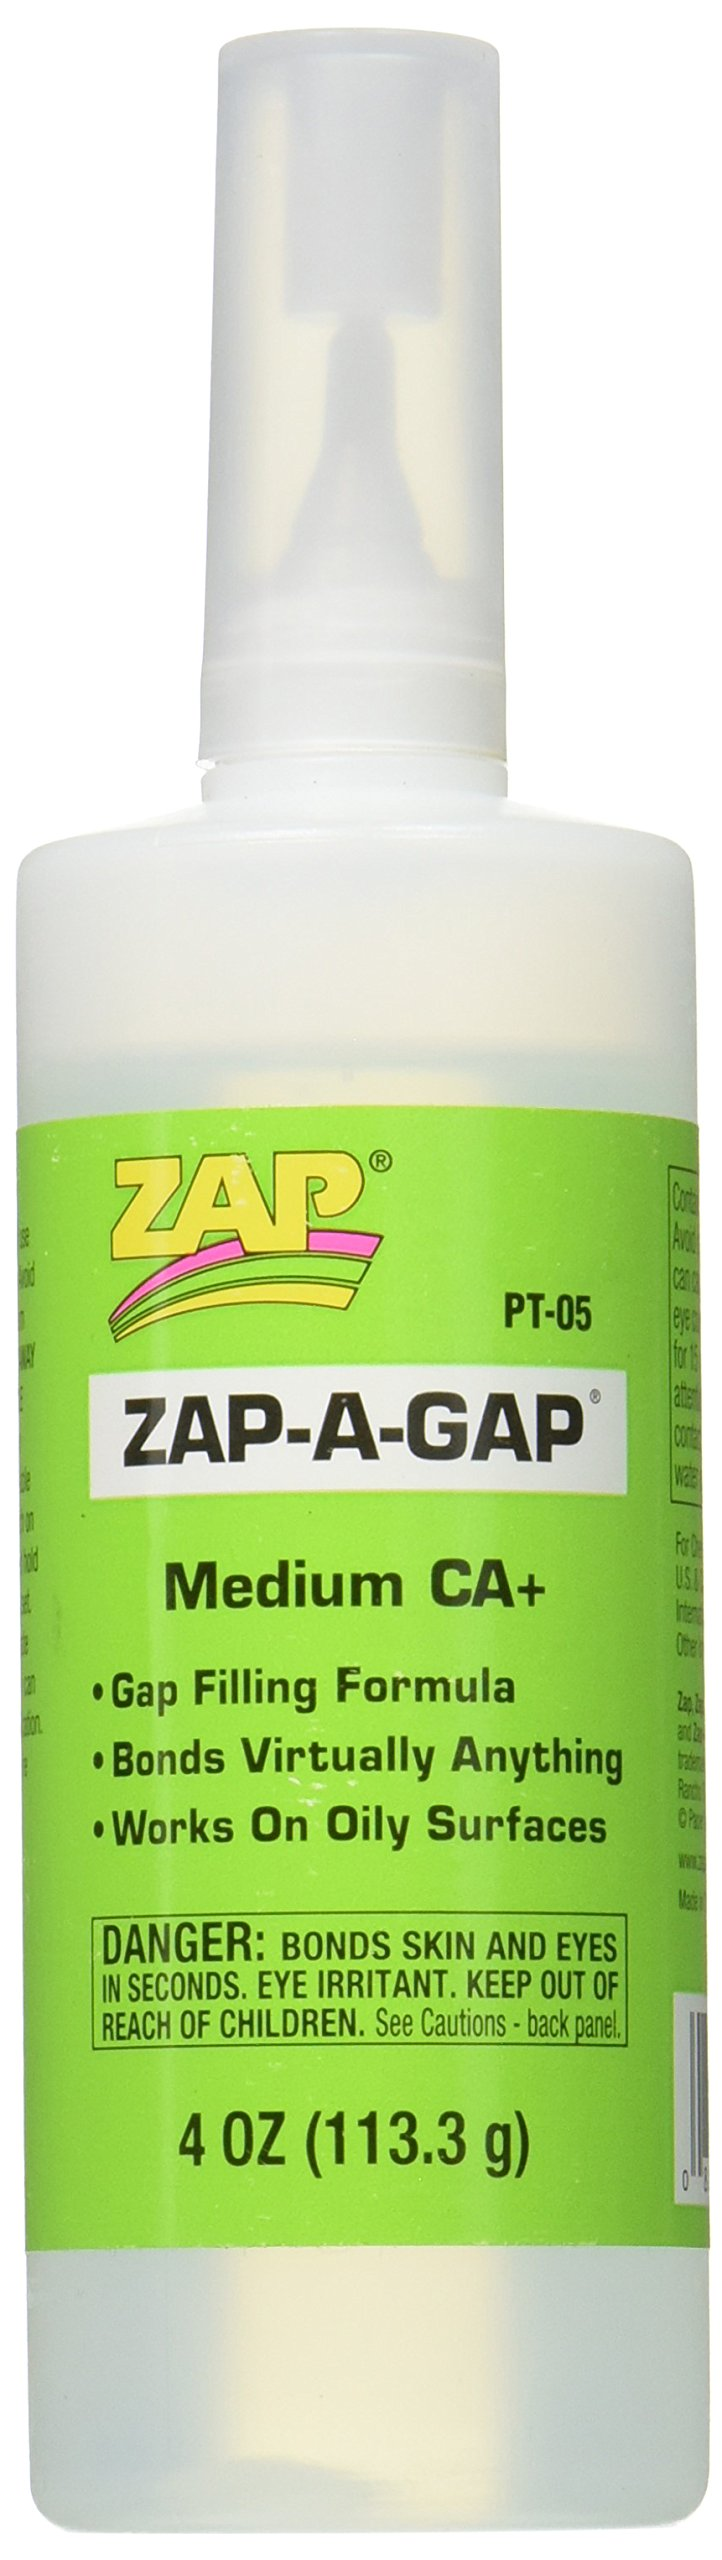 Pacer Technology (Zap) Zap-A-Gap Adhesives, 4 oz